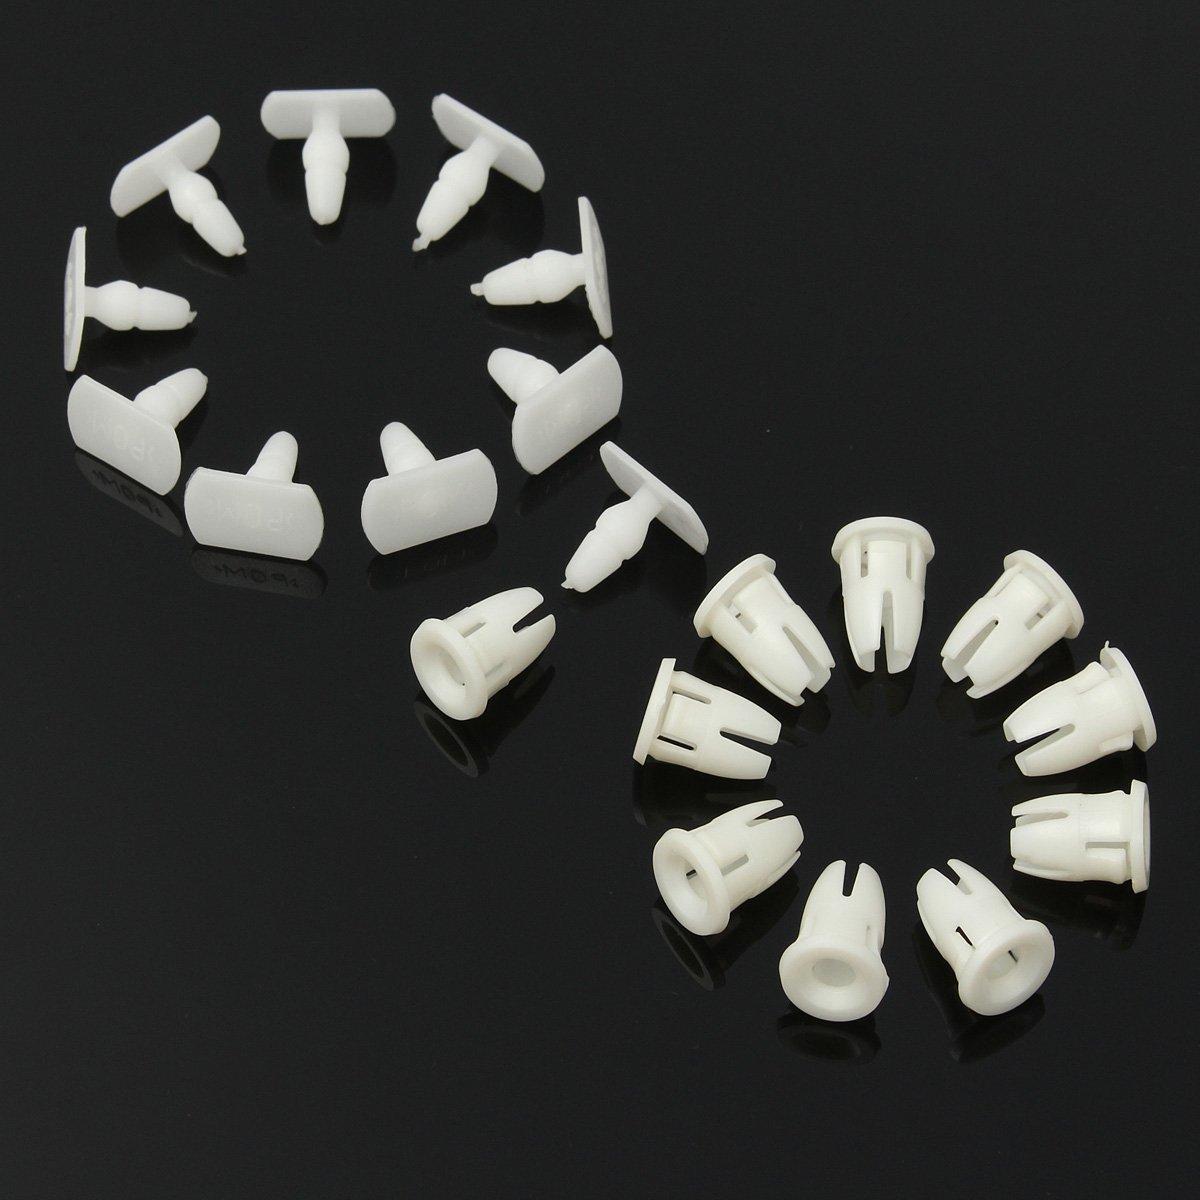 NICOLIE 10pcs Side Skirt Door Sill Card Panel Linning Repair Trim Clips For Mercedes Benz